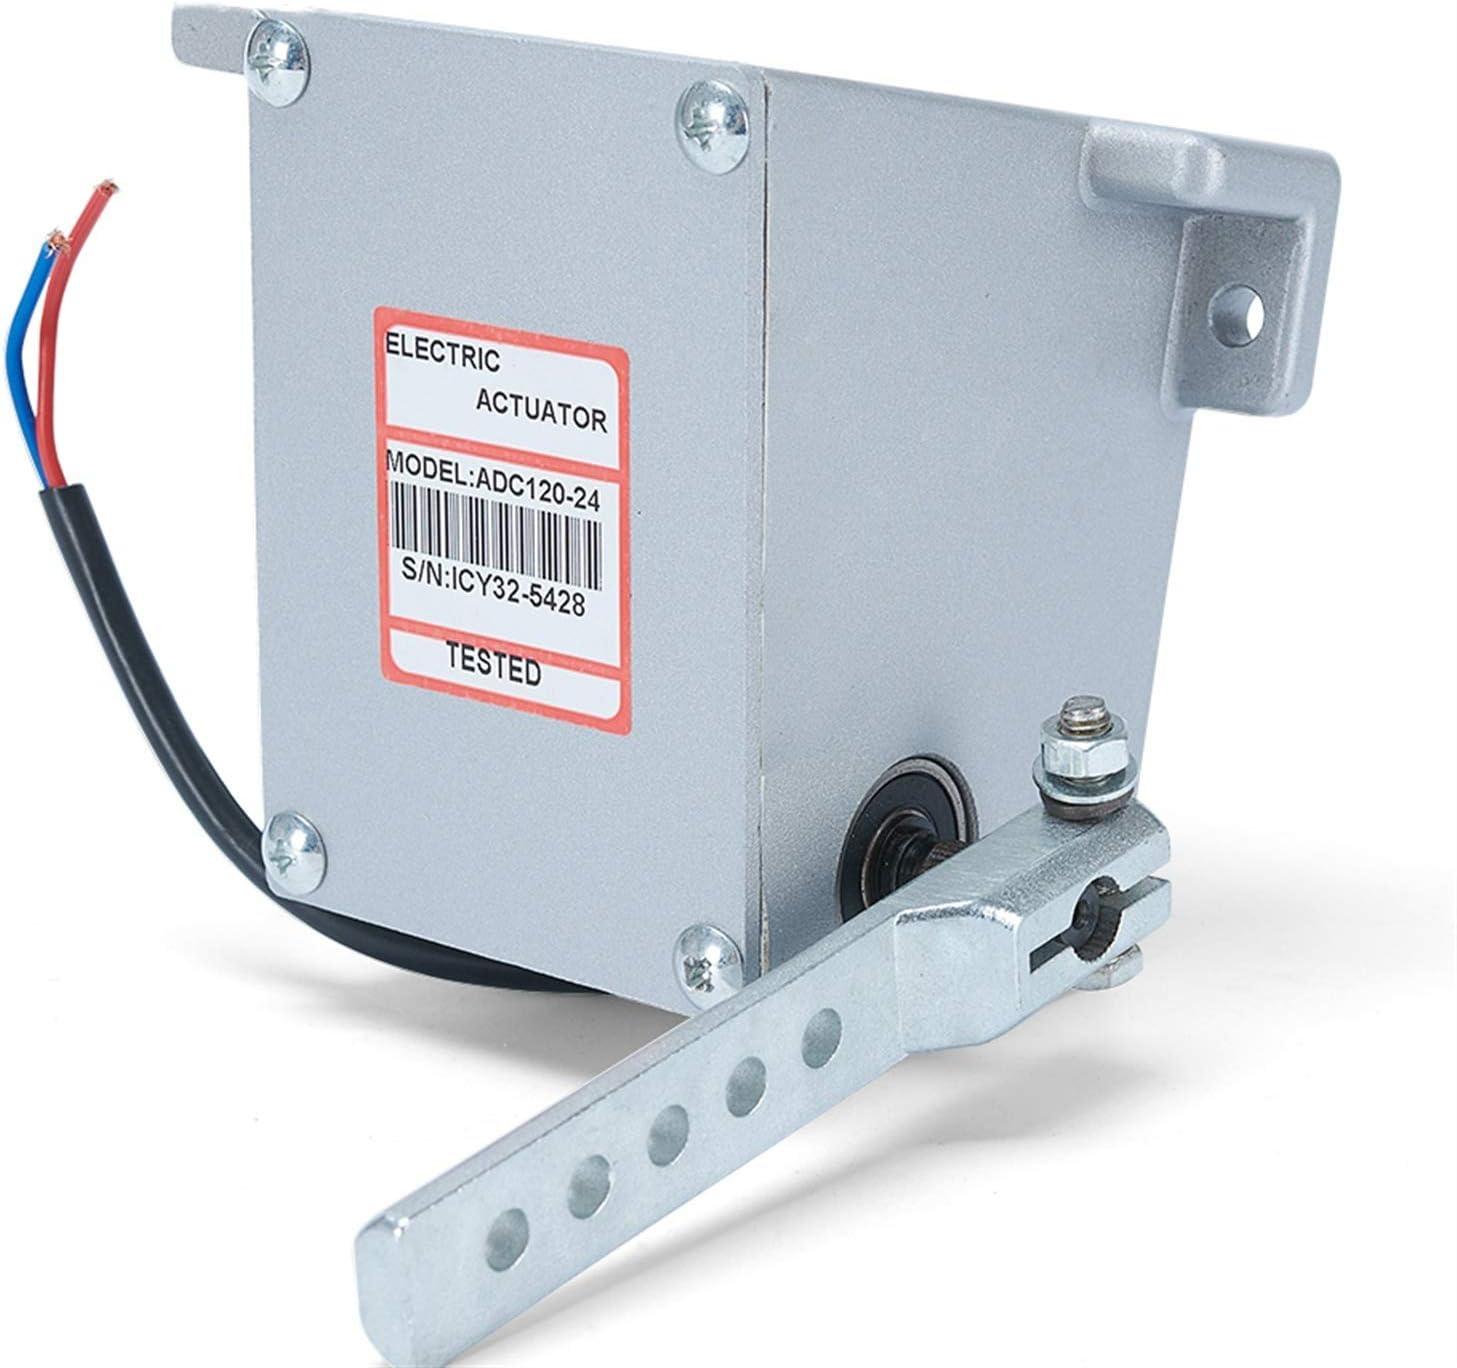 ADC120 12V 24V Controlador electrónico ACTUADOR DE Motor GOVORNOR Bomba DE Combustible Diesel GENSET Parte Lineal ROTORK Tipo Externo Actuador (Color : 24V)